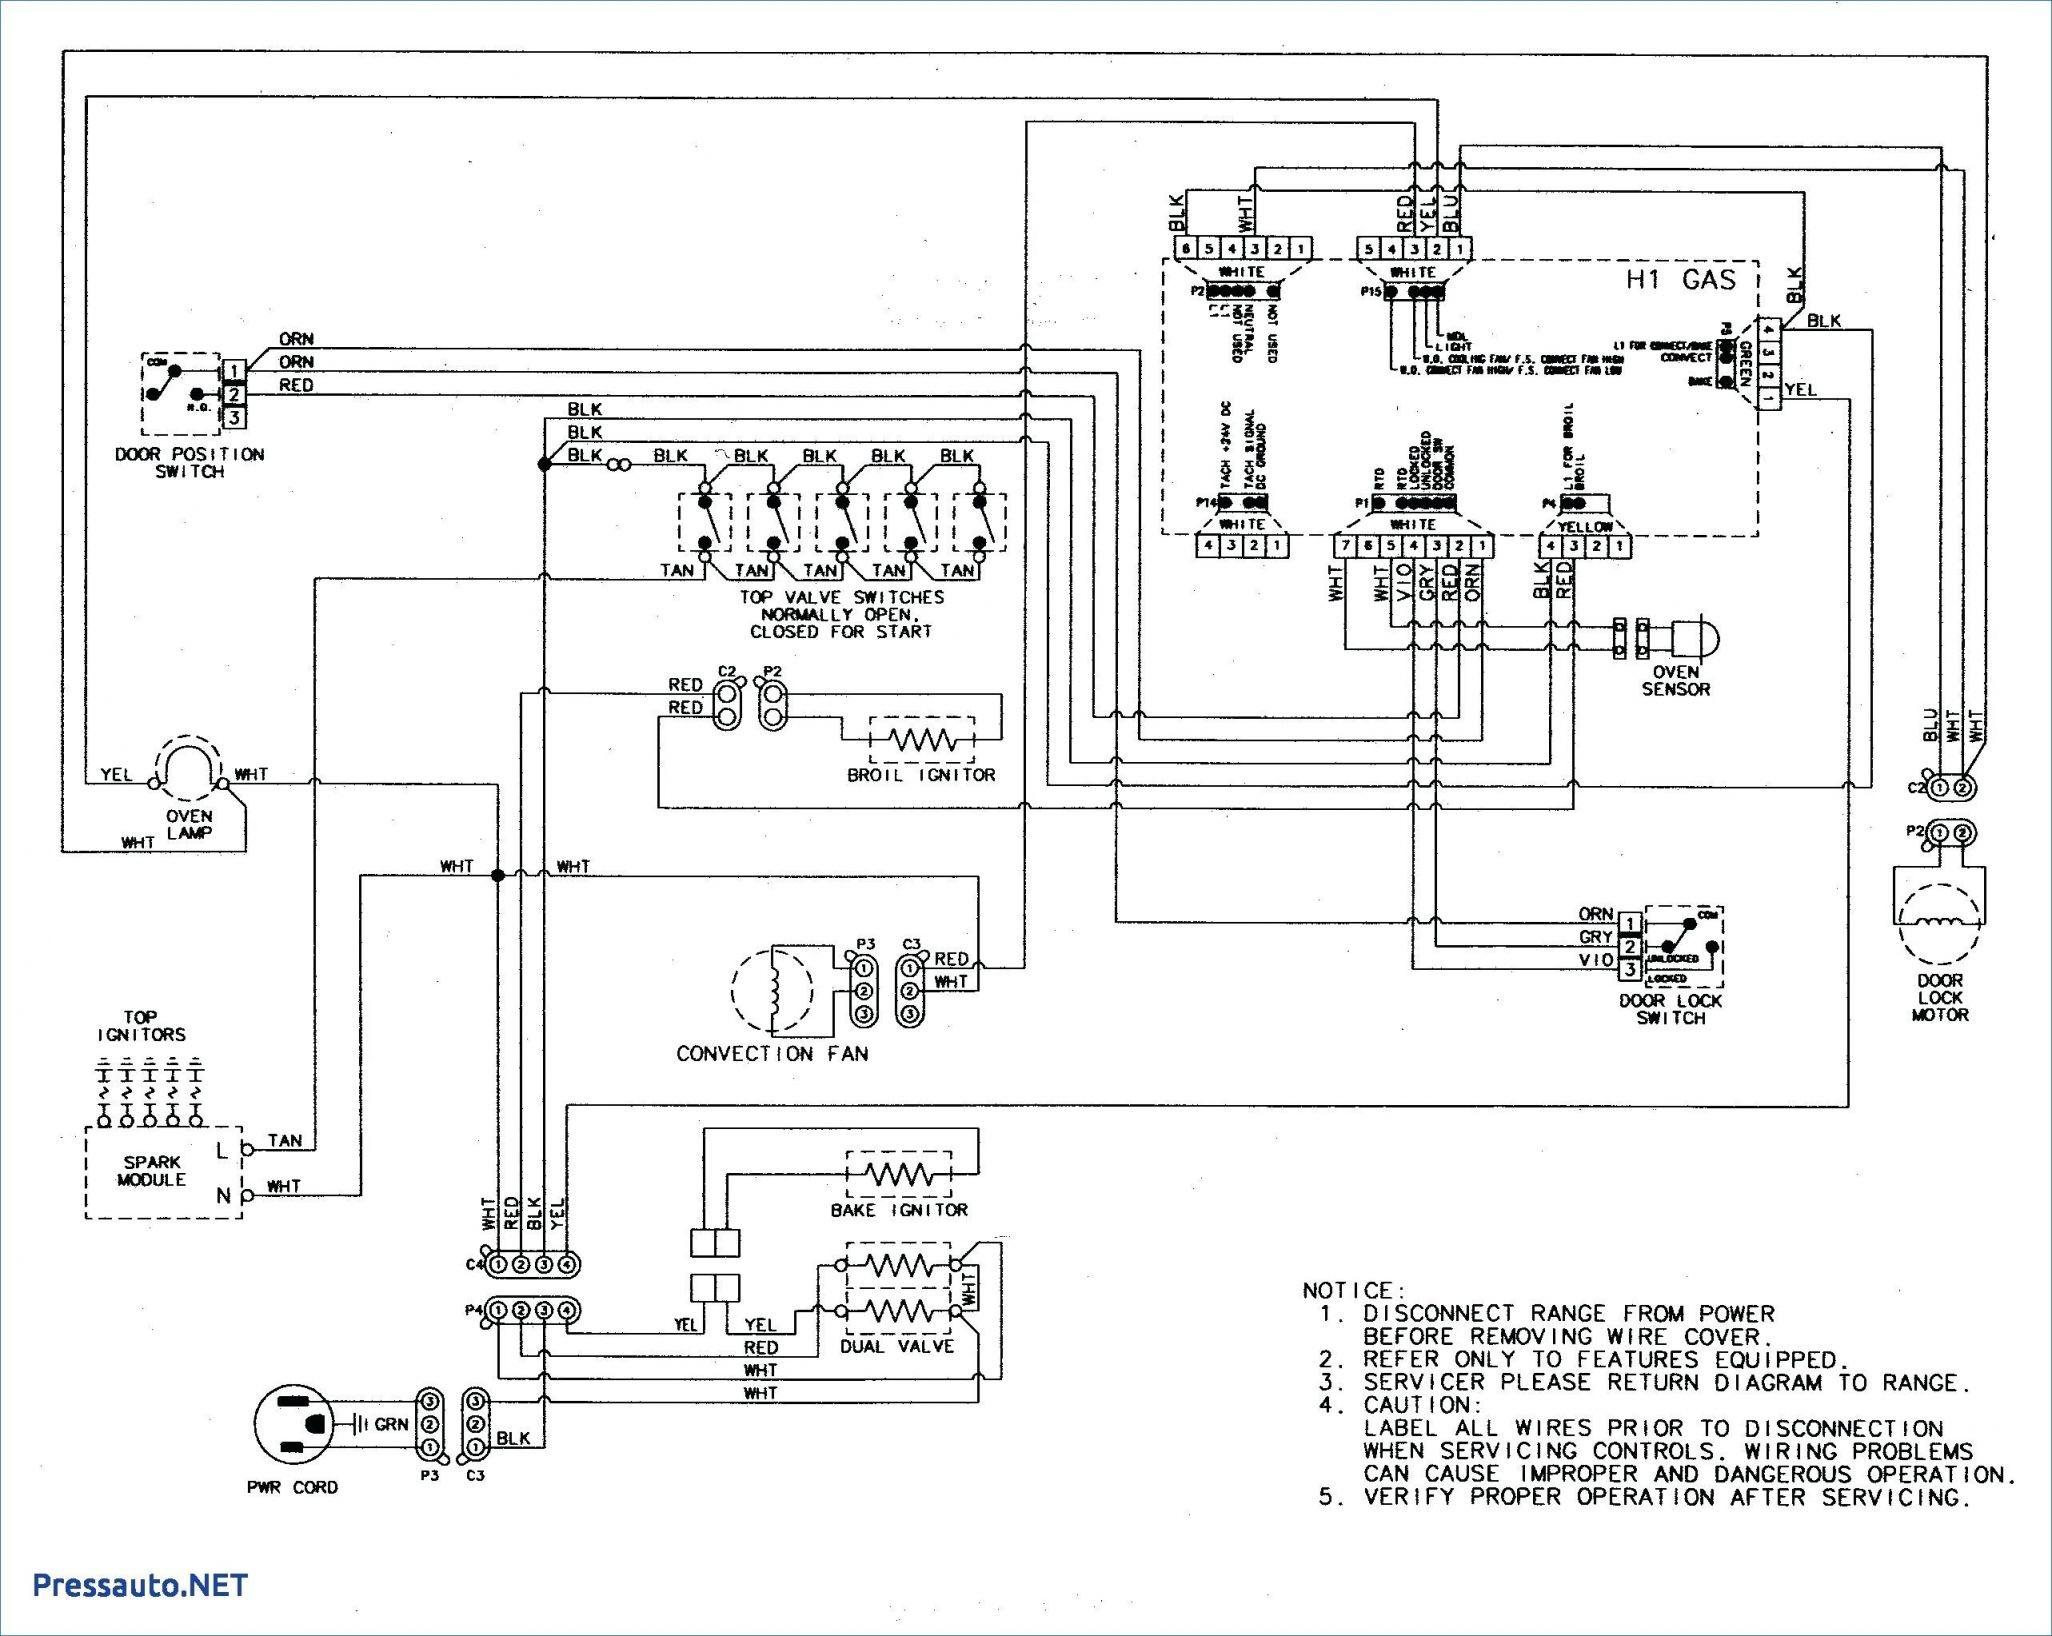 Harmar Wiring Harness - All Diagram Schematics on